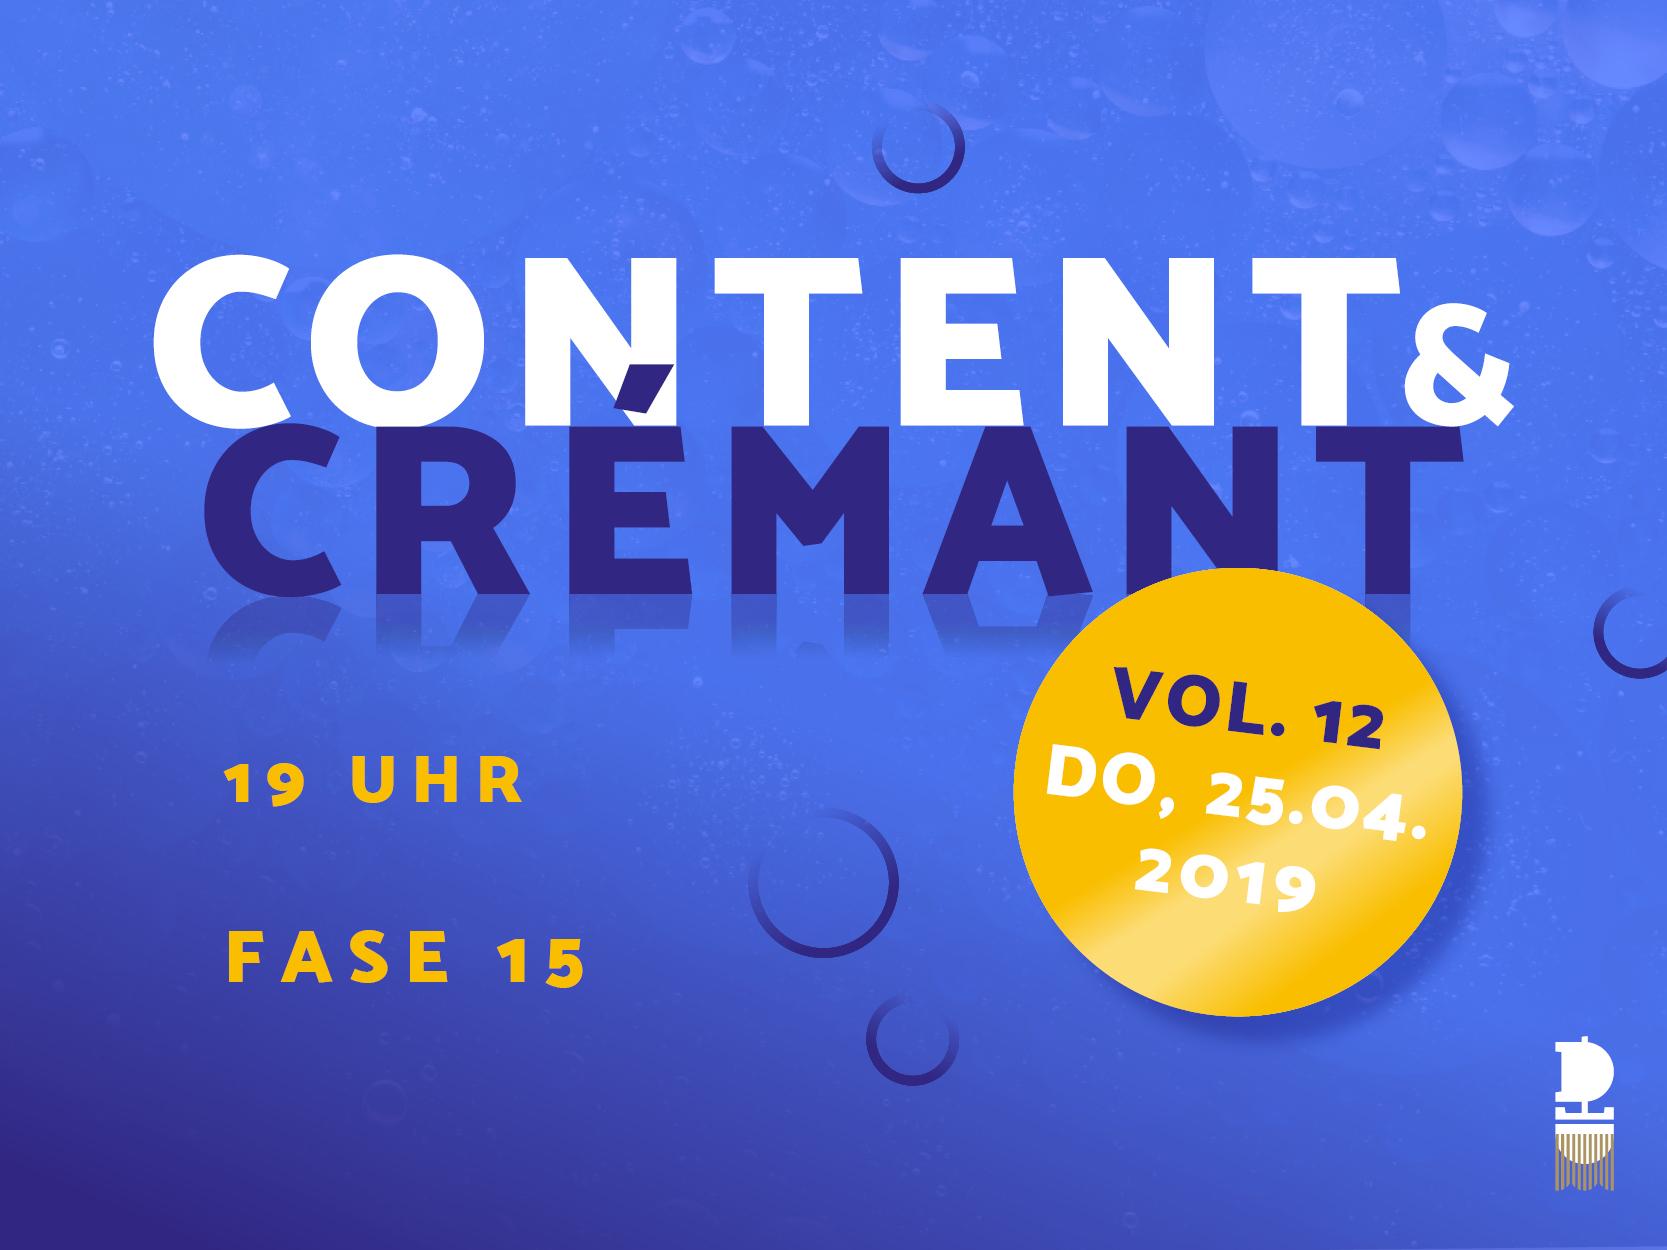 Content & Cremant